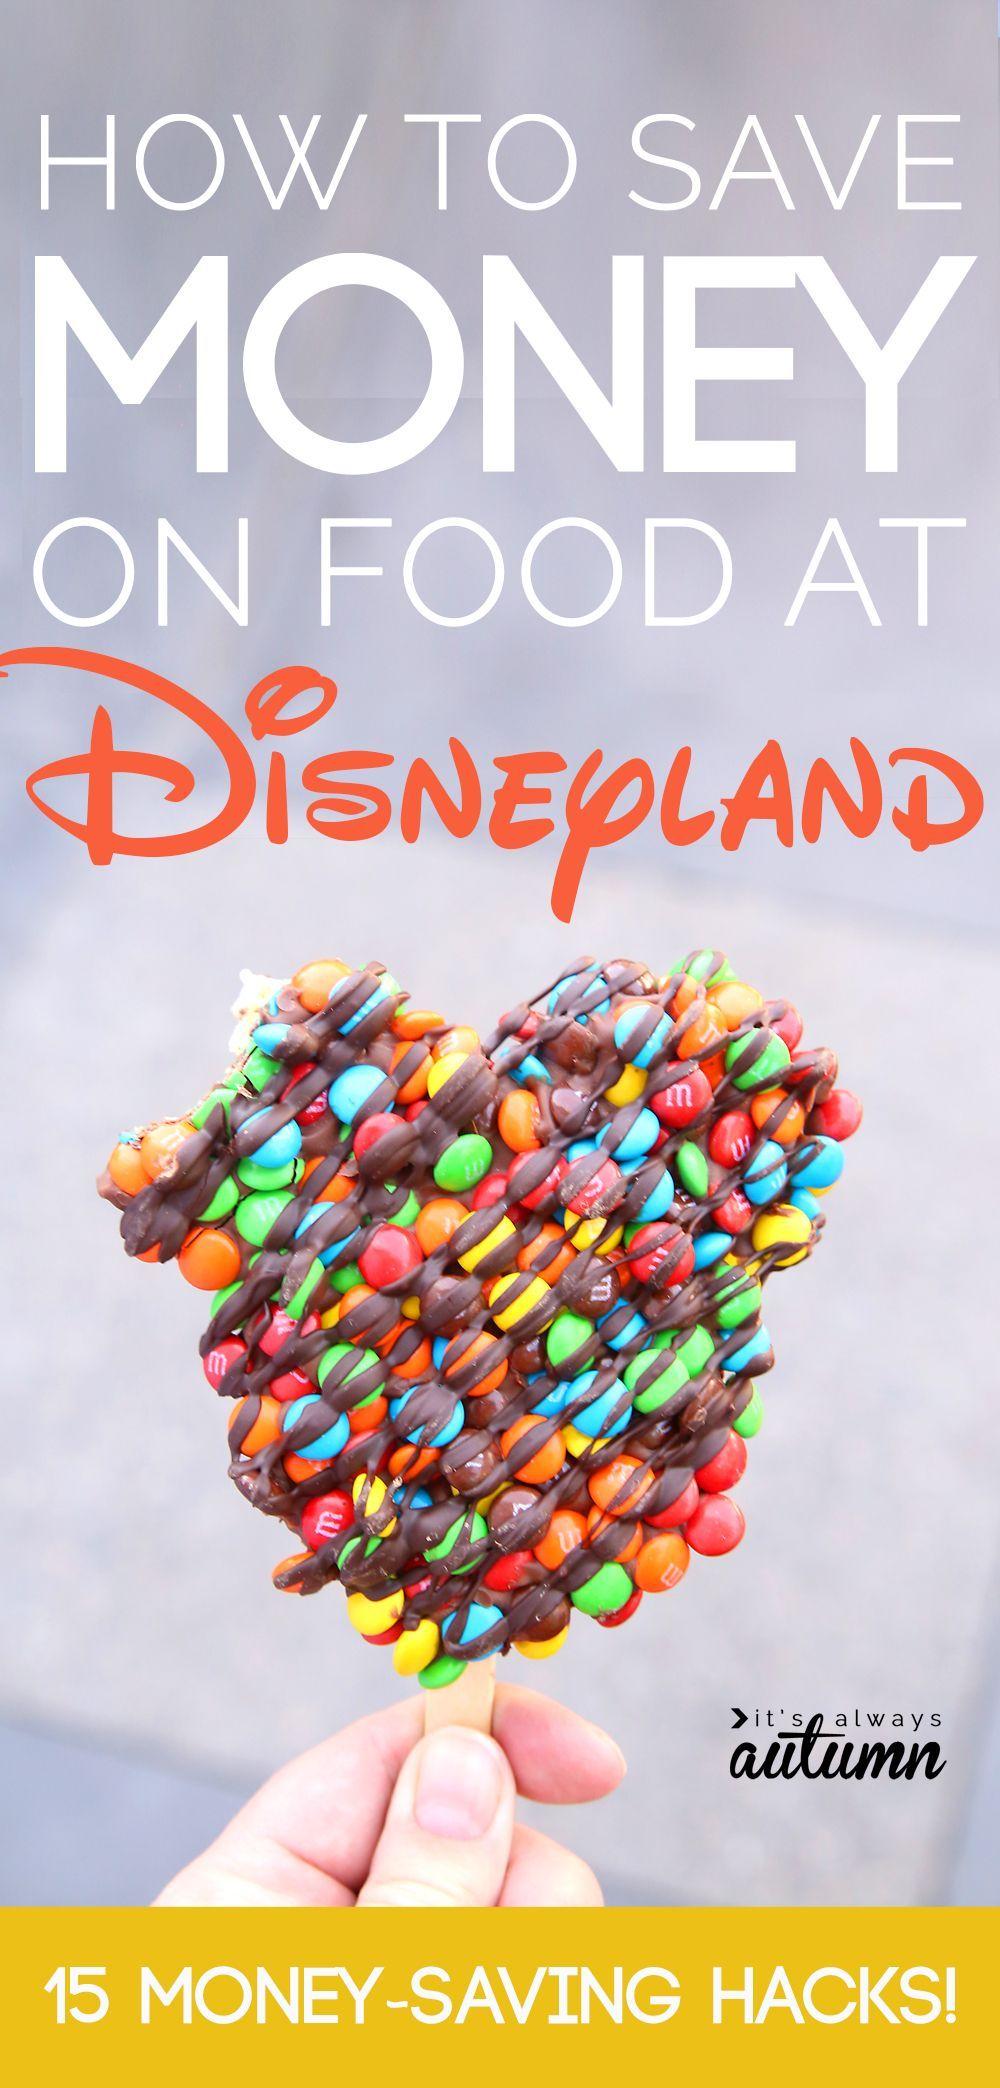 best hacks for saving money on food at Disneyland #disneylandfood